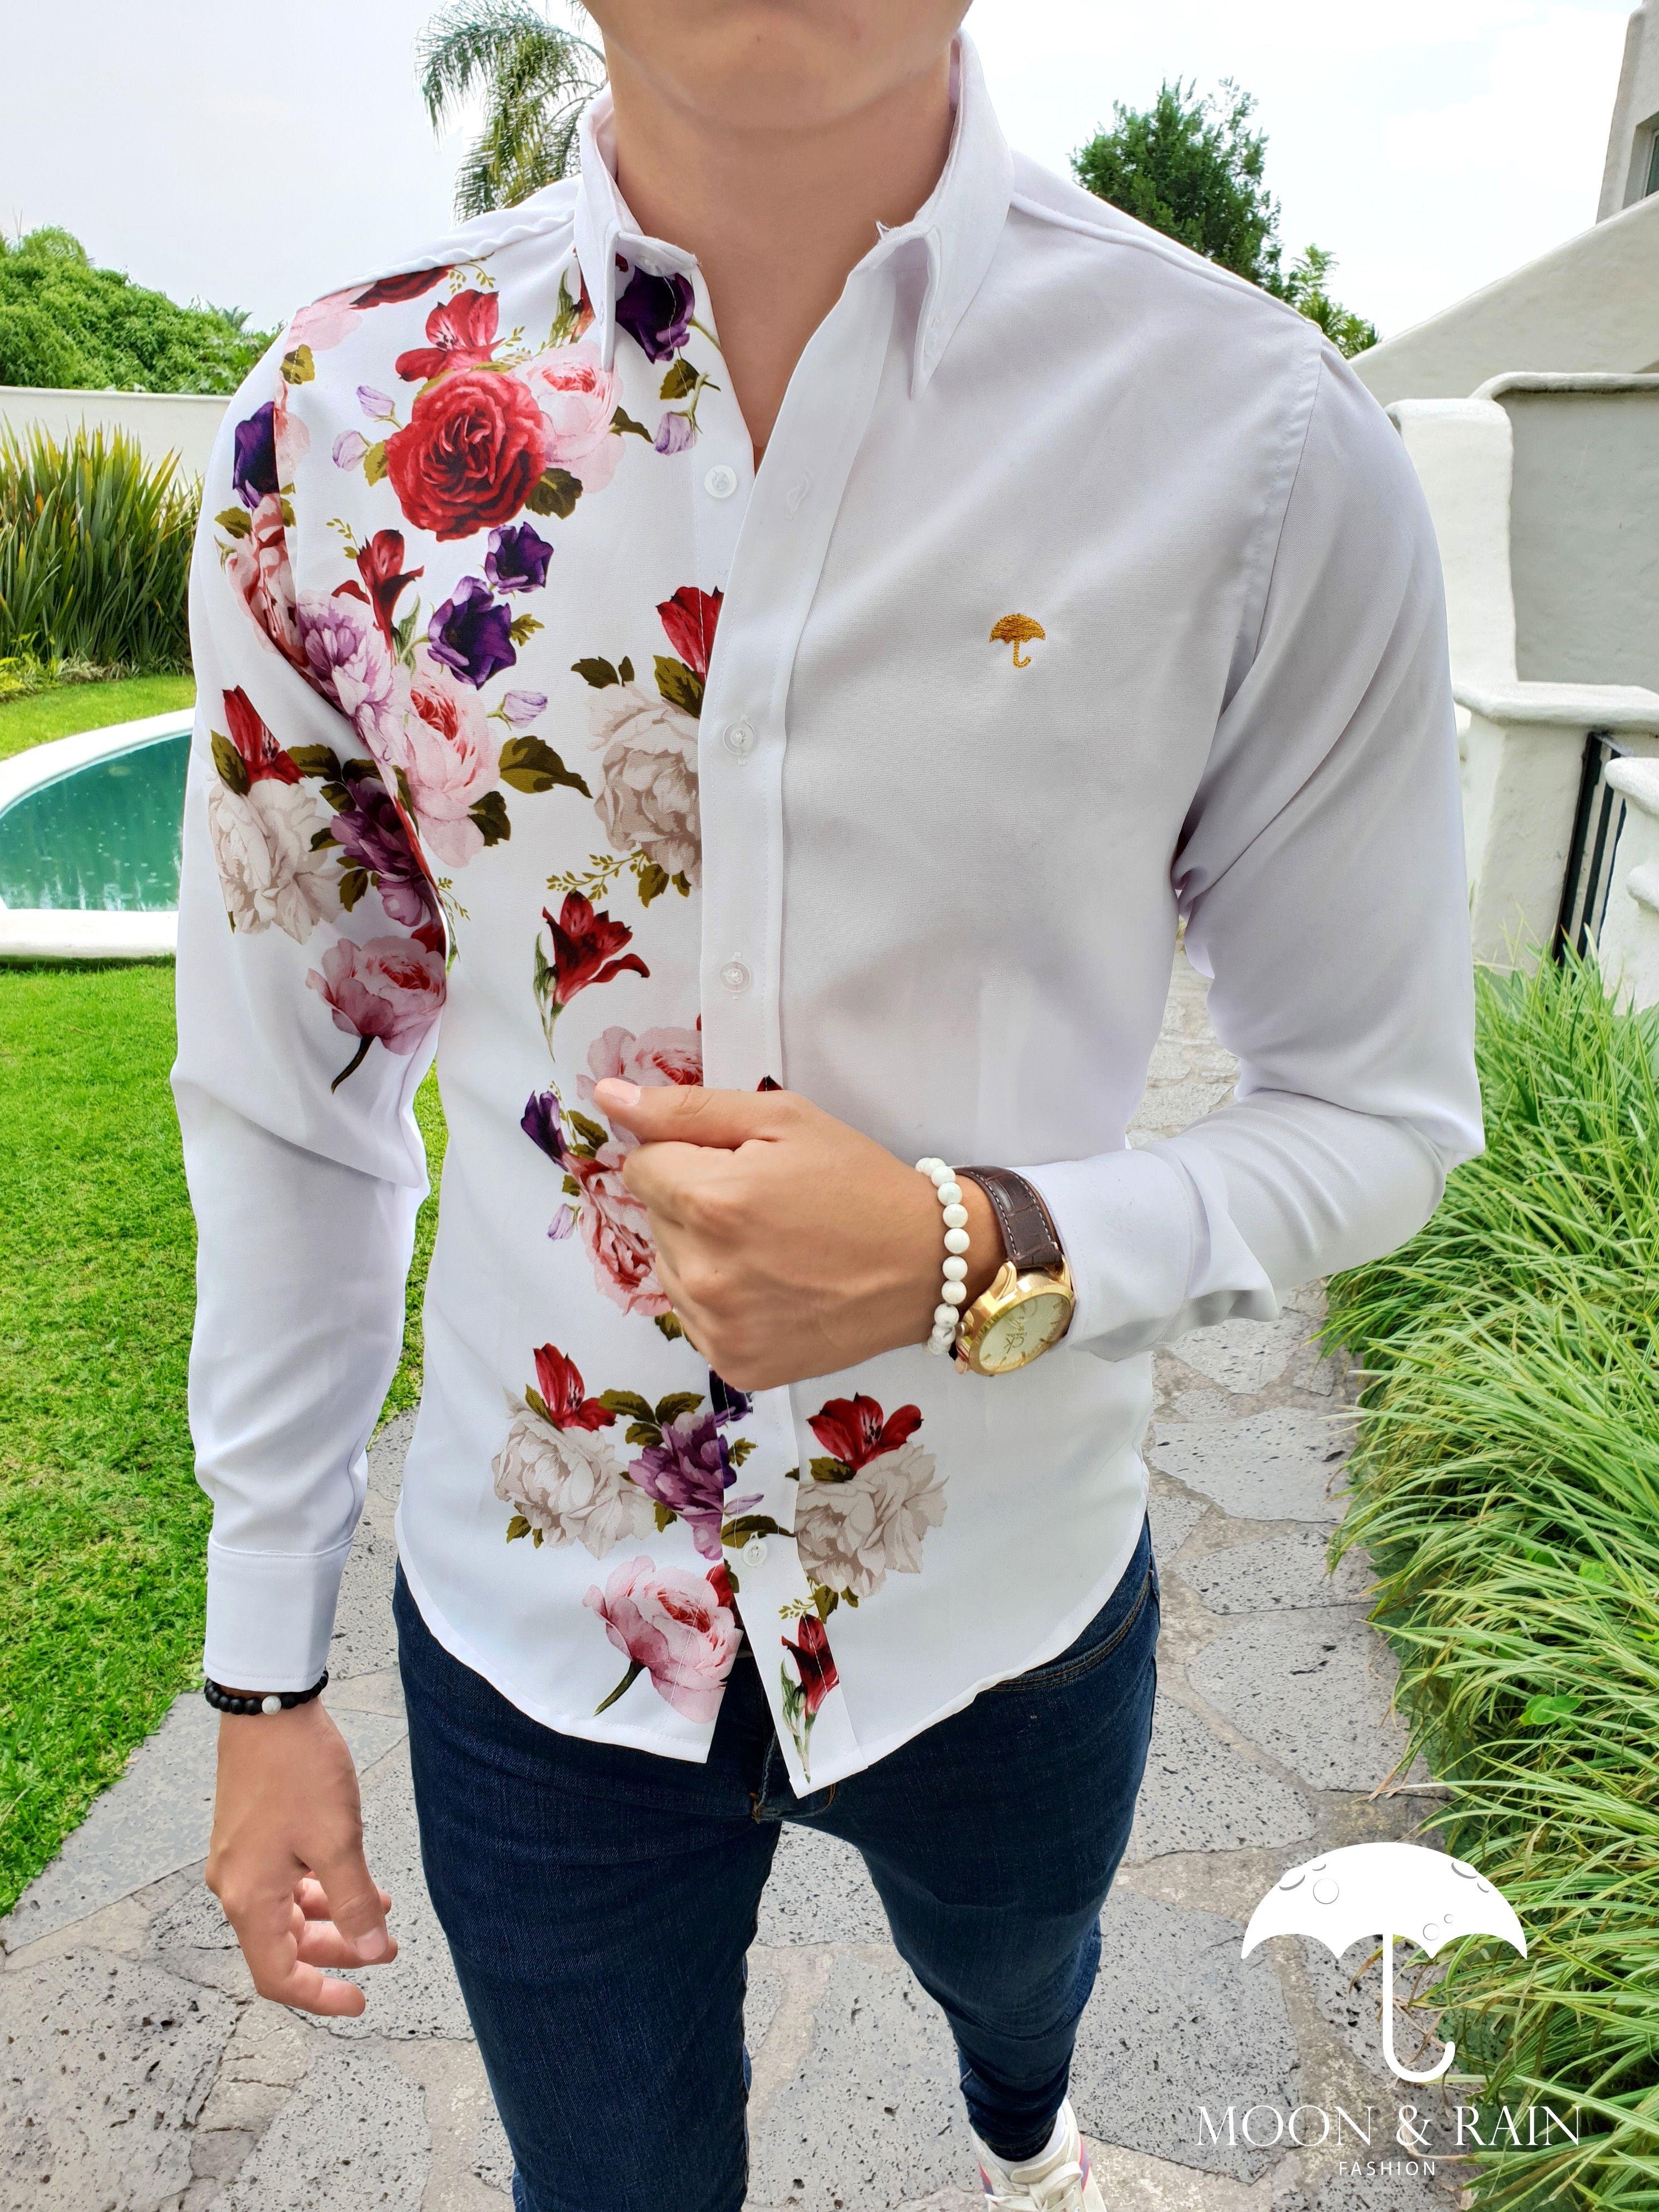 6239765db7b Outfit para hombre  camisa slim fit deluxe blanca flores rosas ...